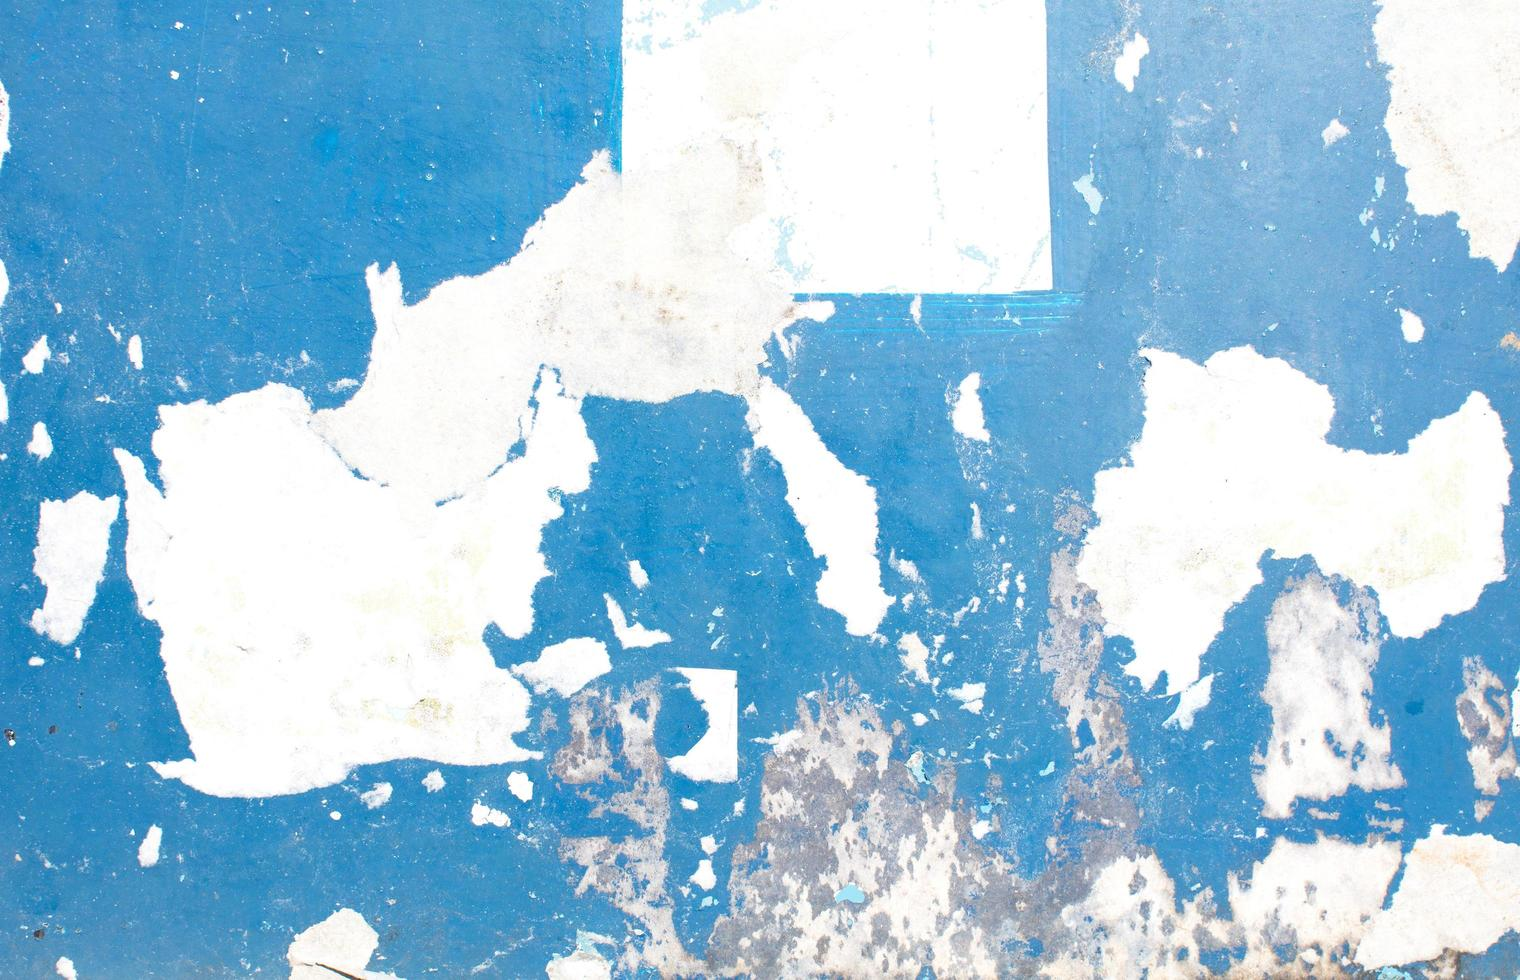 pintura azul desconchada foto